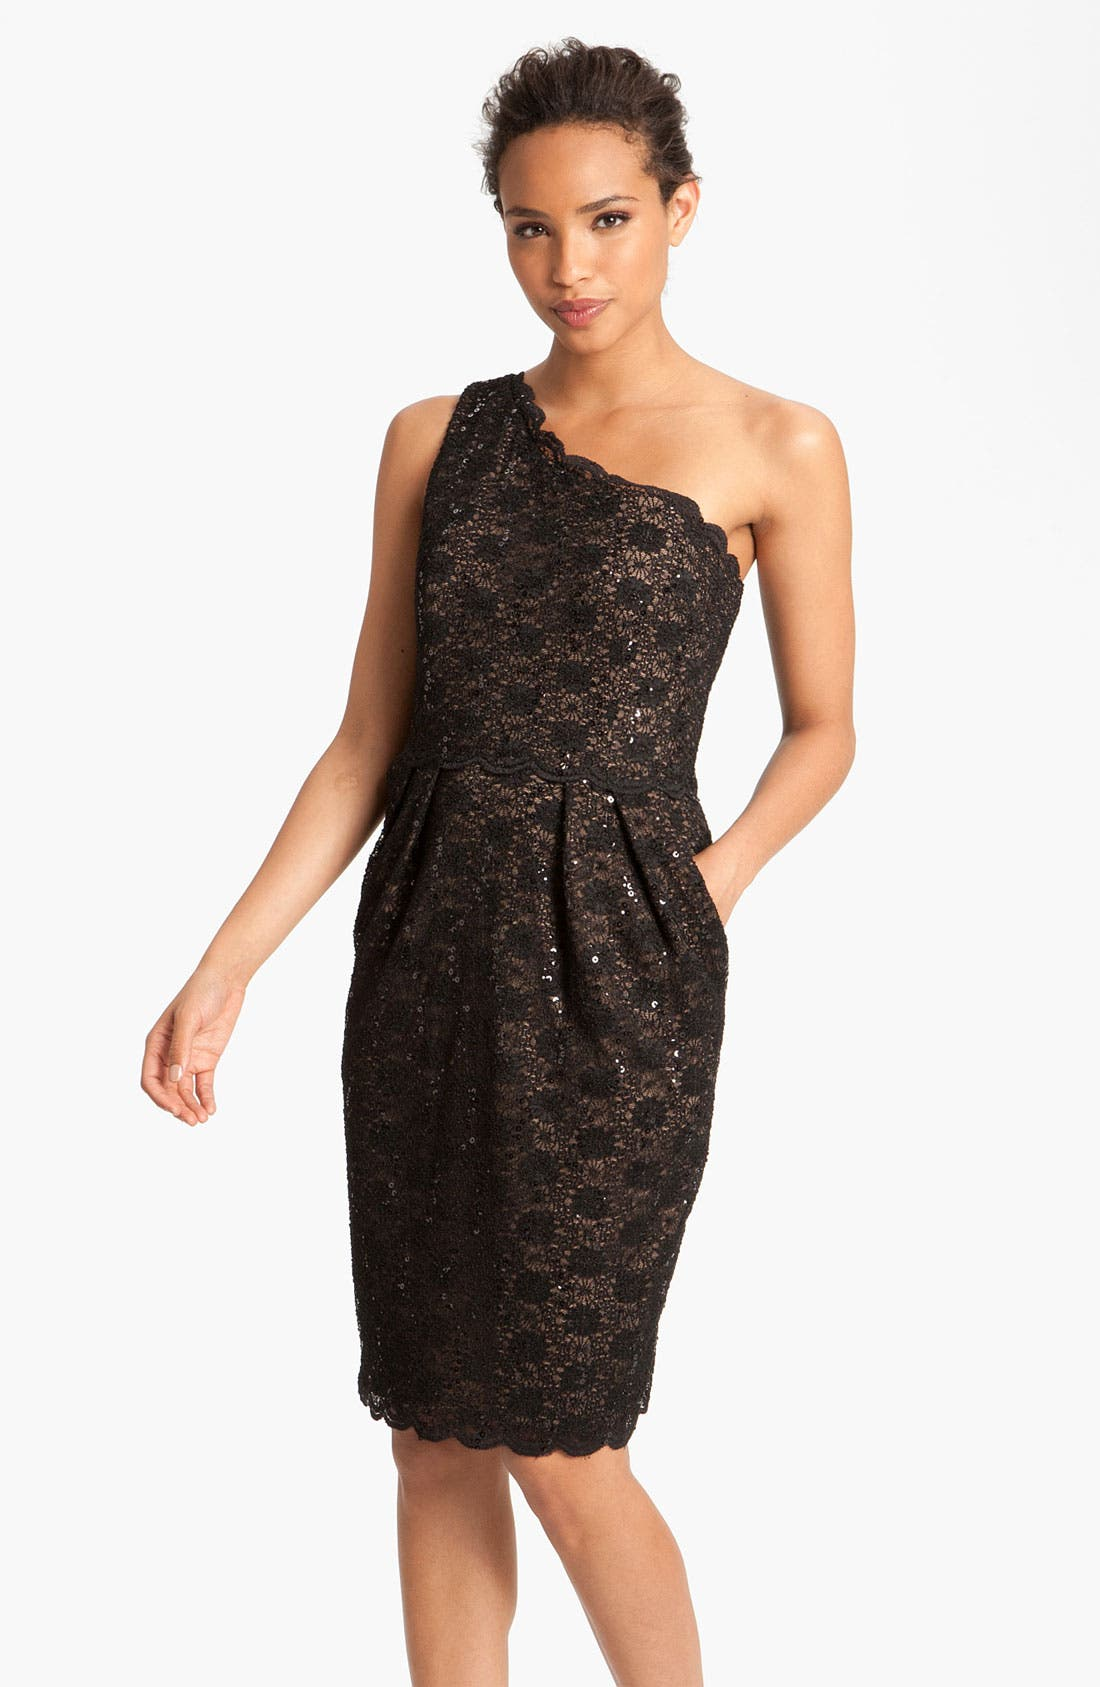 Alternate Image 1 Selected - Alex Evenings One Shoulder Lace Sheath Dress